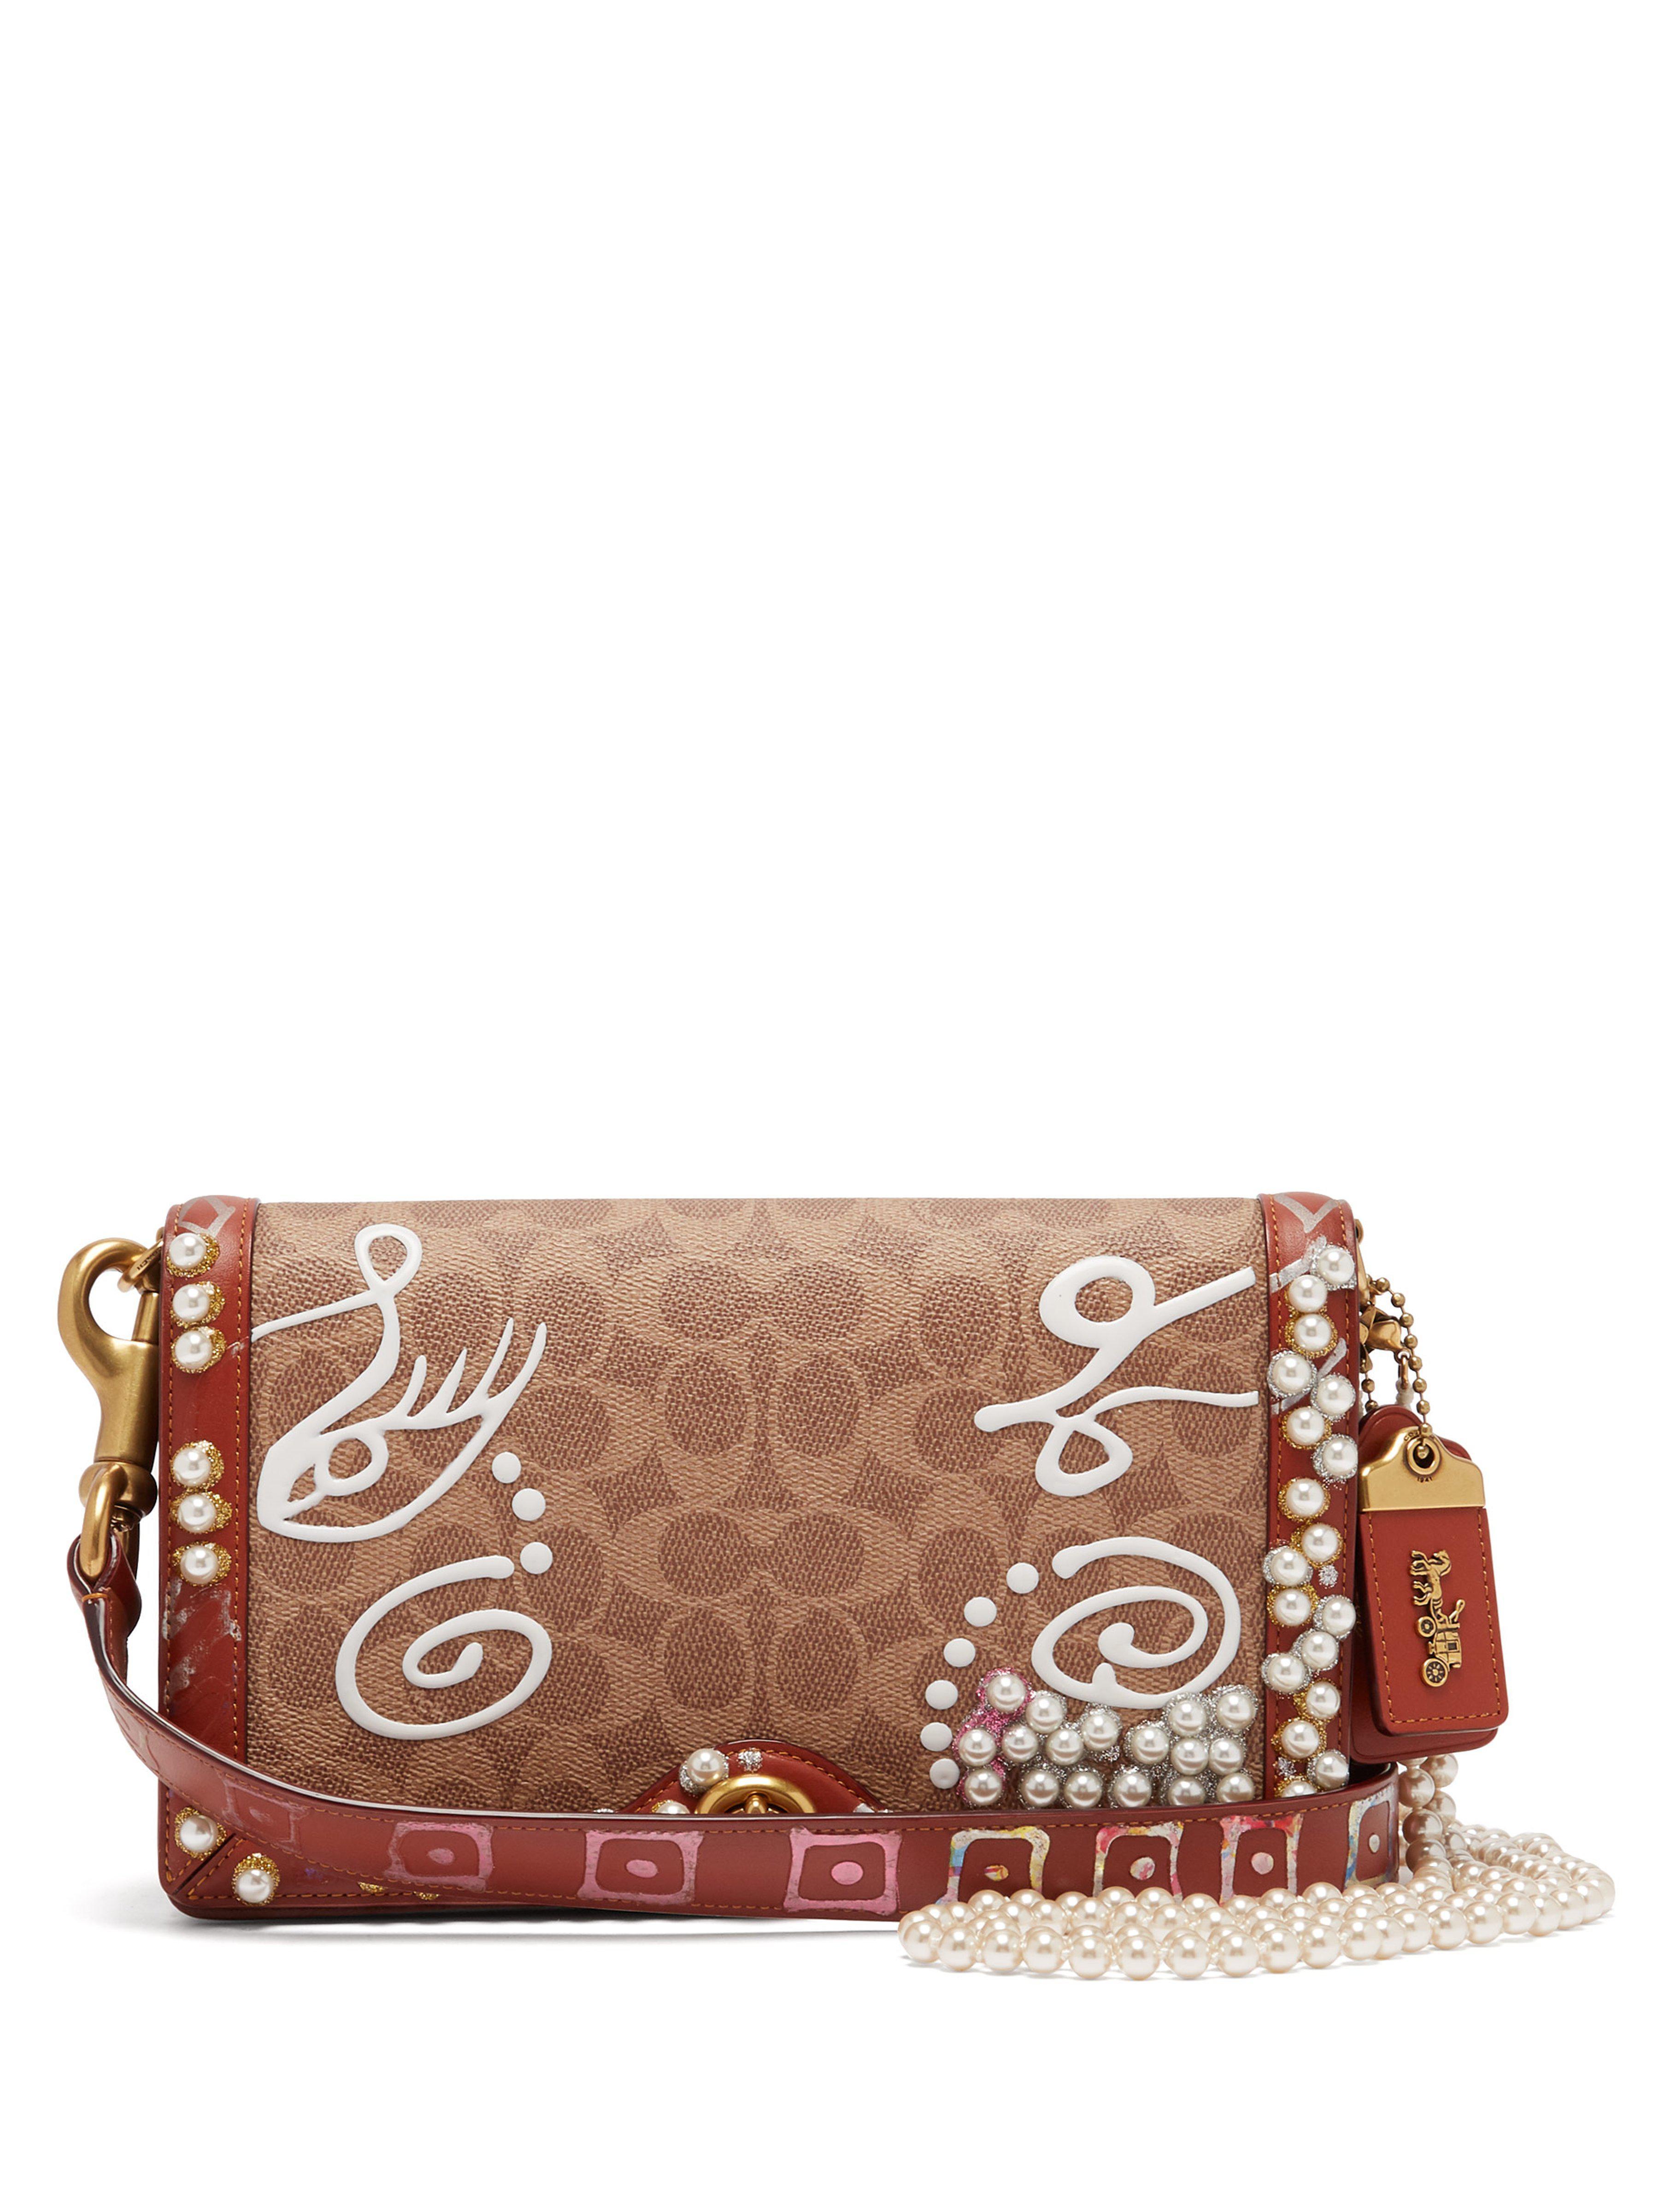 MATTY BOVAN Coach X Riley Signature Bag in Brown - Lyst c071c2cf58bbd